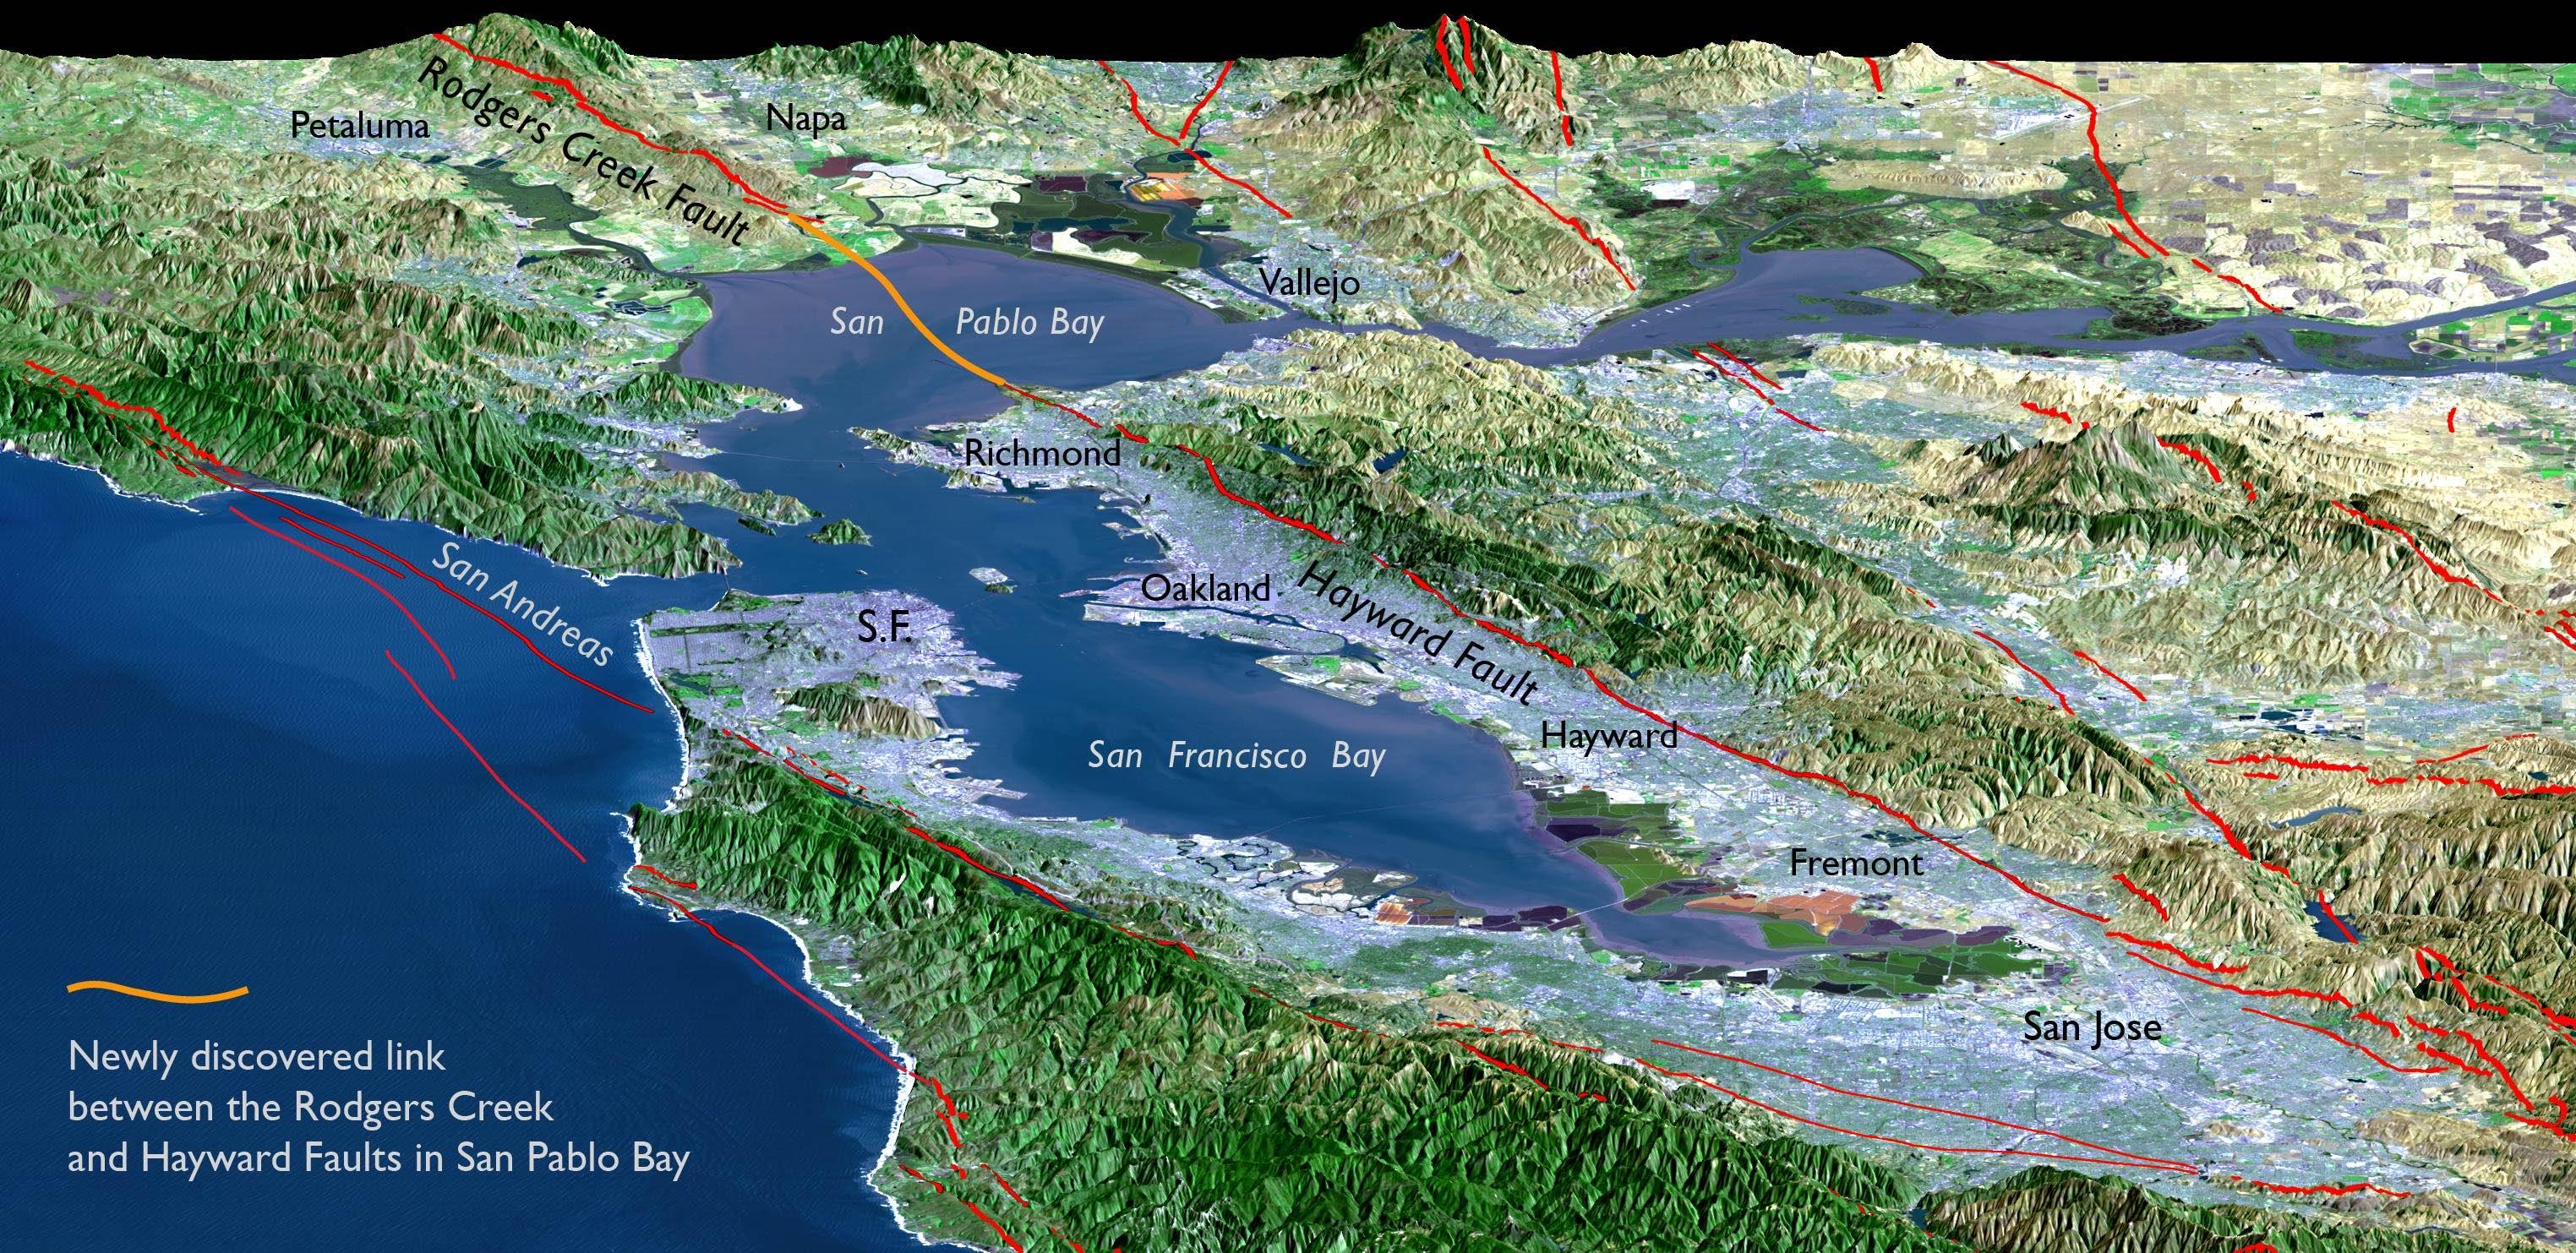 hayward-rodger-creek-fault-bay-area-fault-map-san-andreas-fault